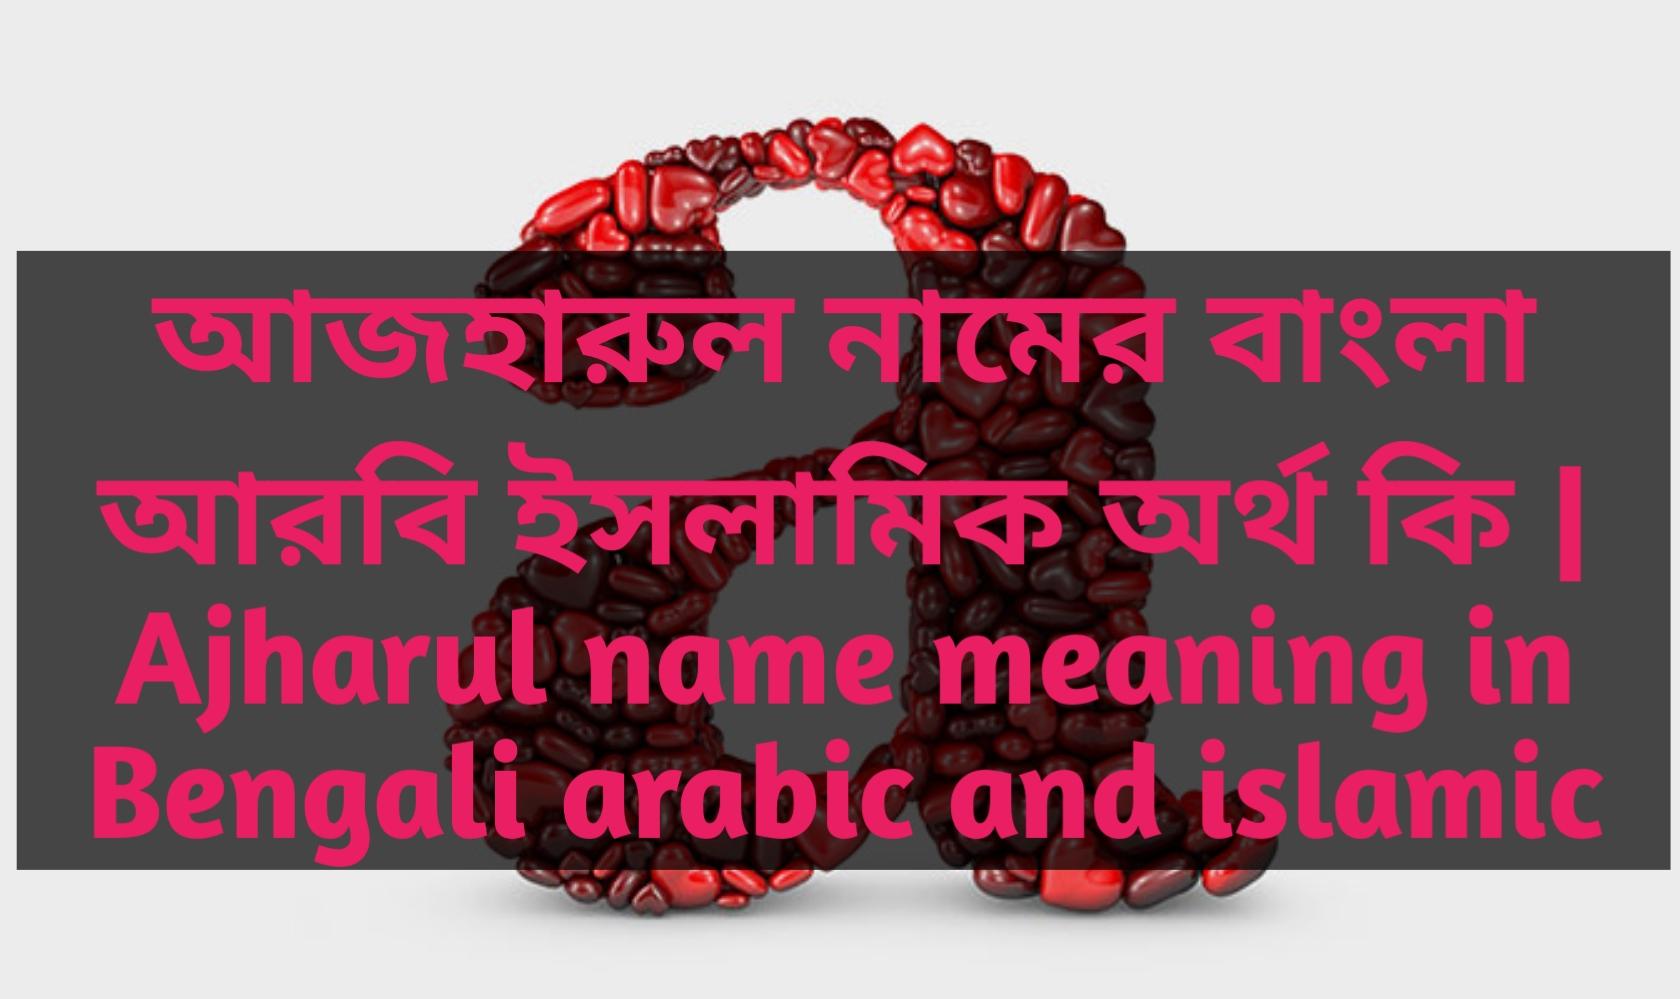 habibur name meaning in Bengali, আজহারুল নামের অর্থ কি, আজহারুল নামের বাংলা অর্থ কি, আজহারুল নামের ইসলামিক অর্থ কি,